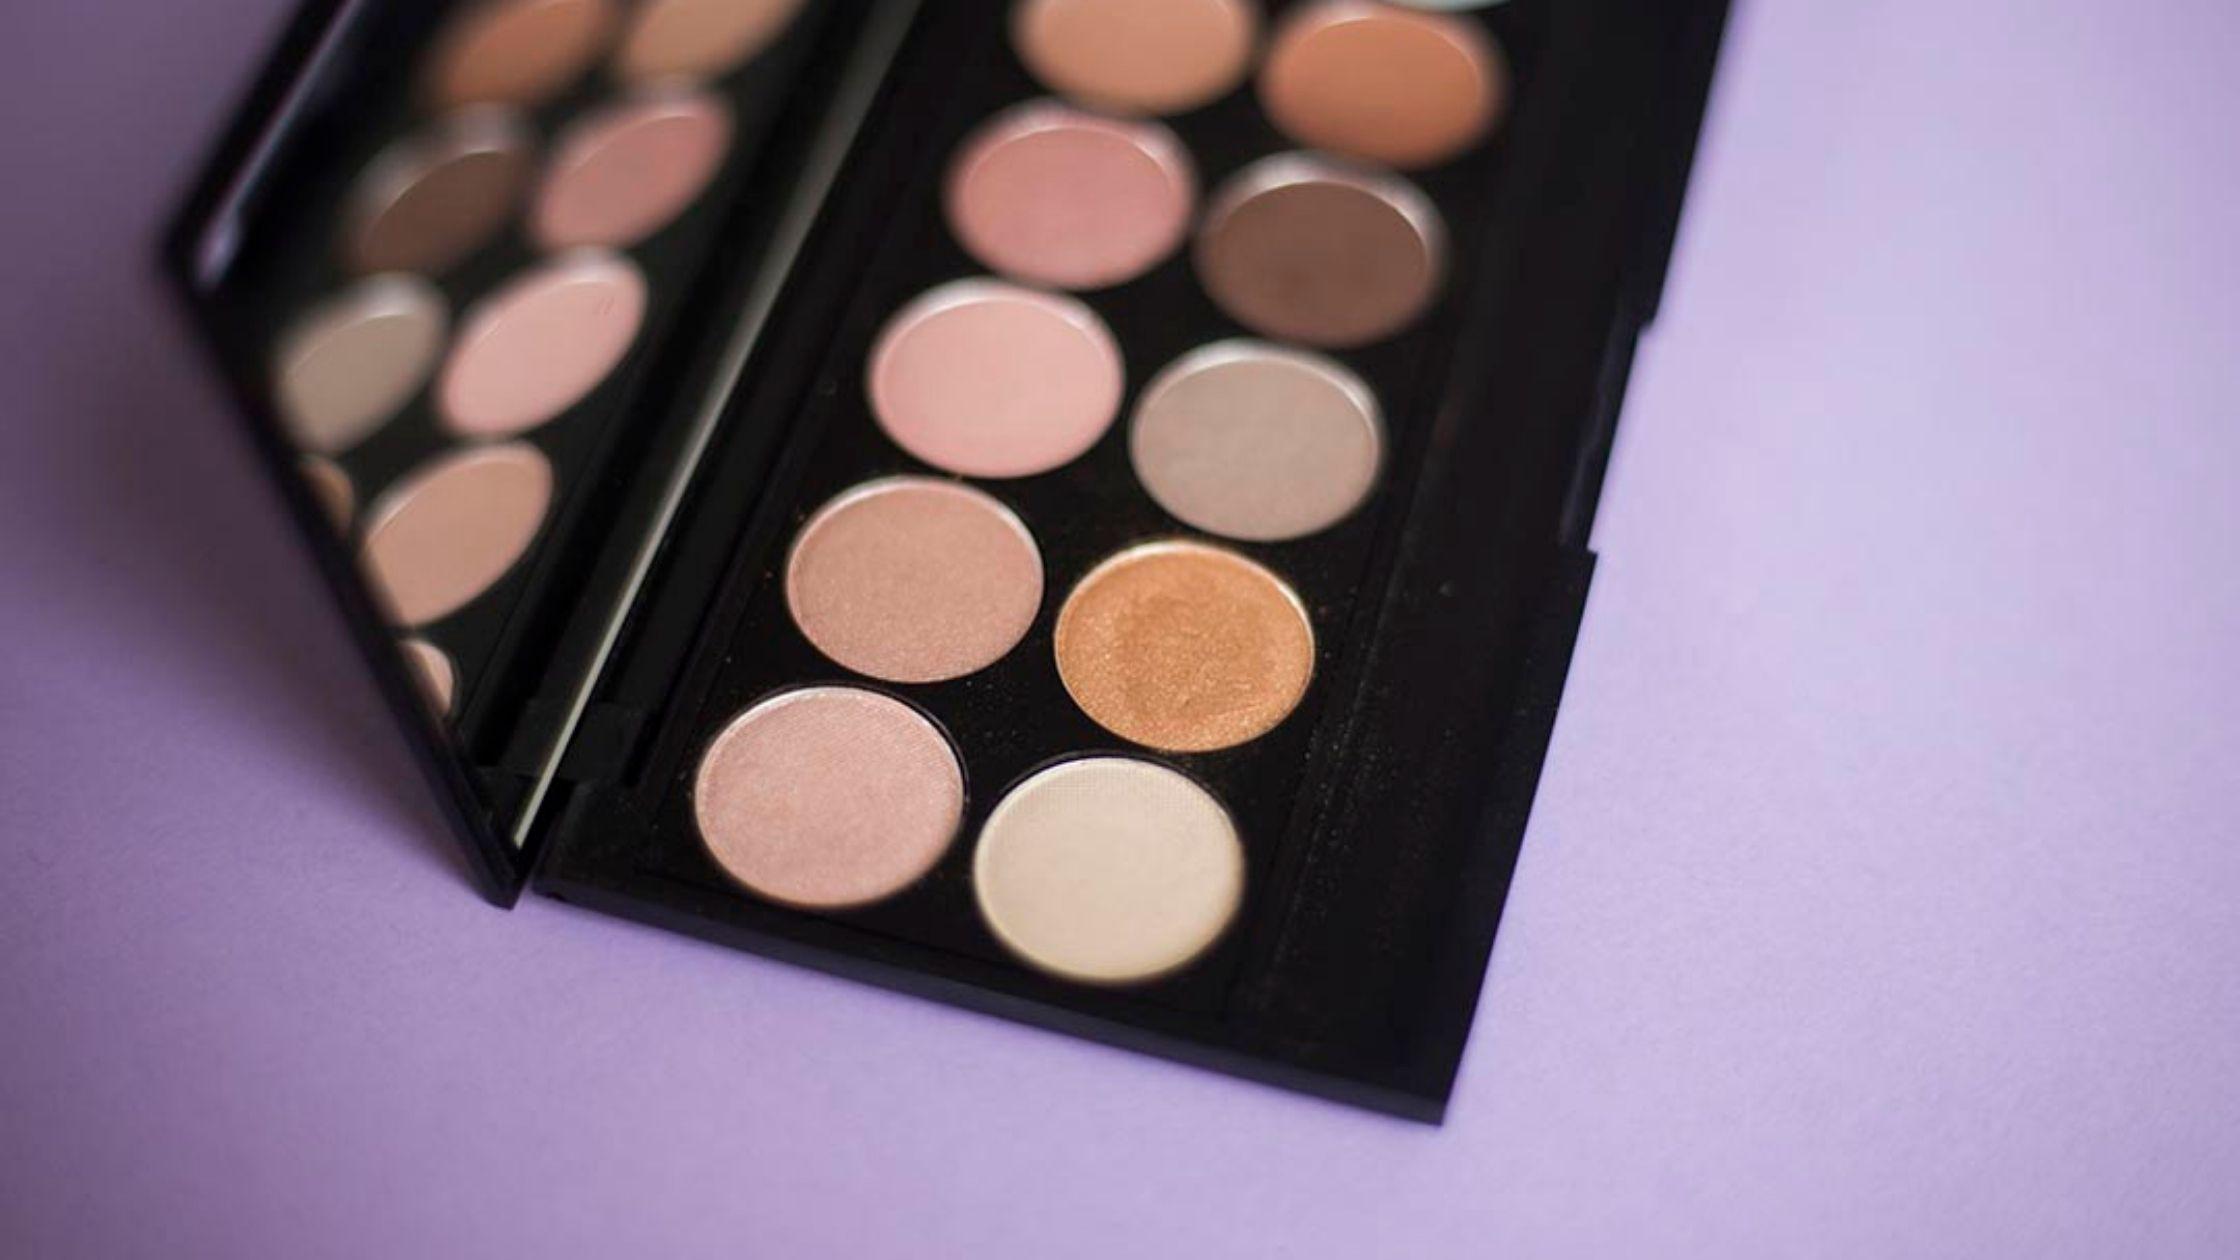 makeup palette for a quick makeup routine